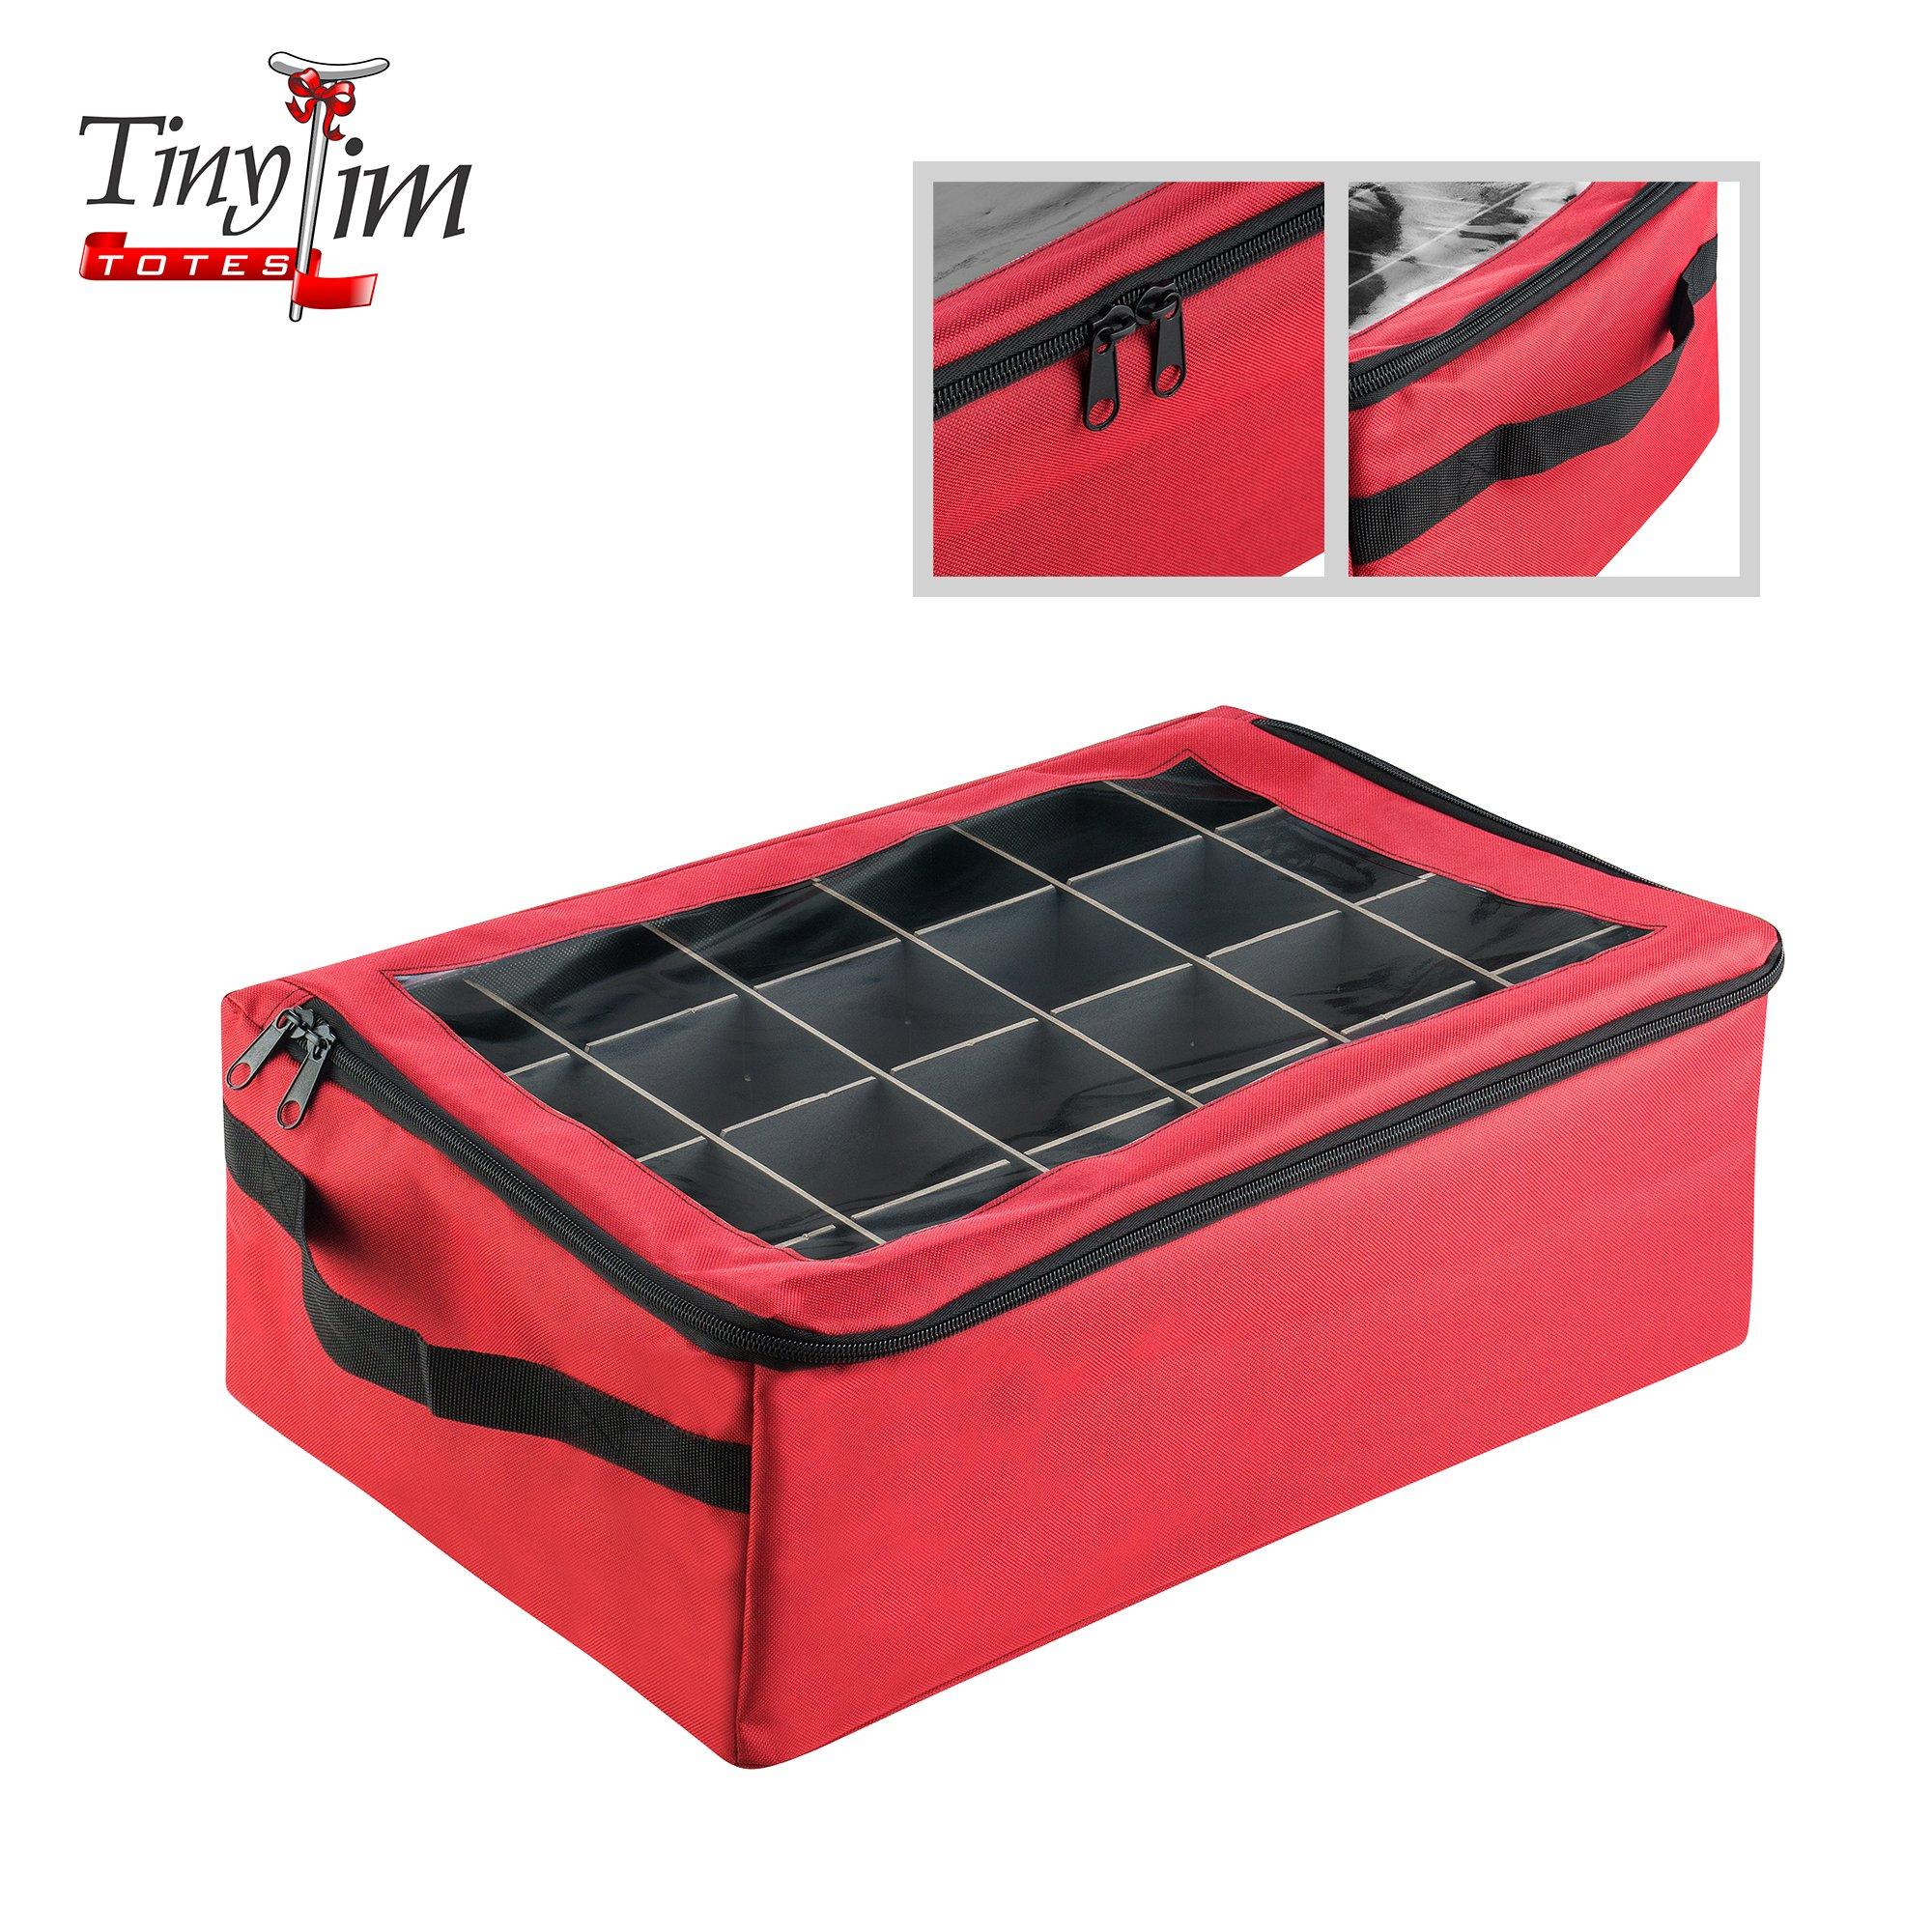 Tiny Tim Totes 83-DT5574 Premium | 48 Christmas Ornament Organizer Storage Box, Red